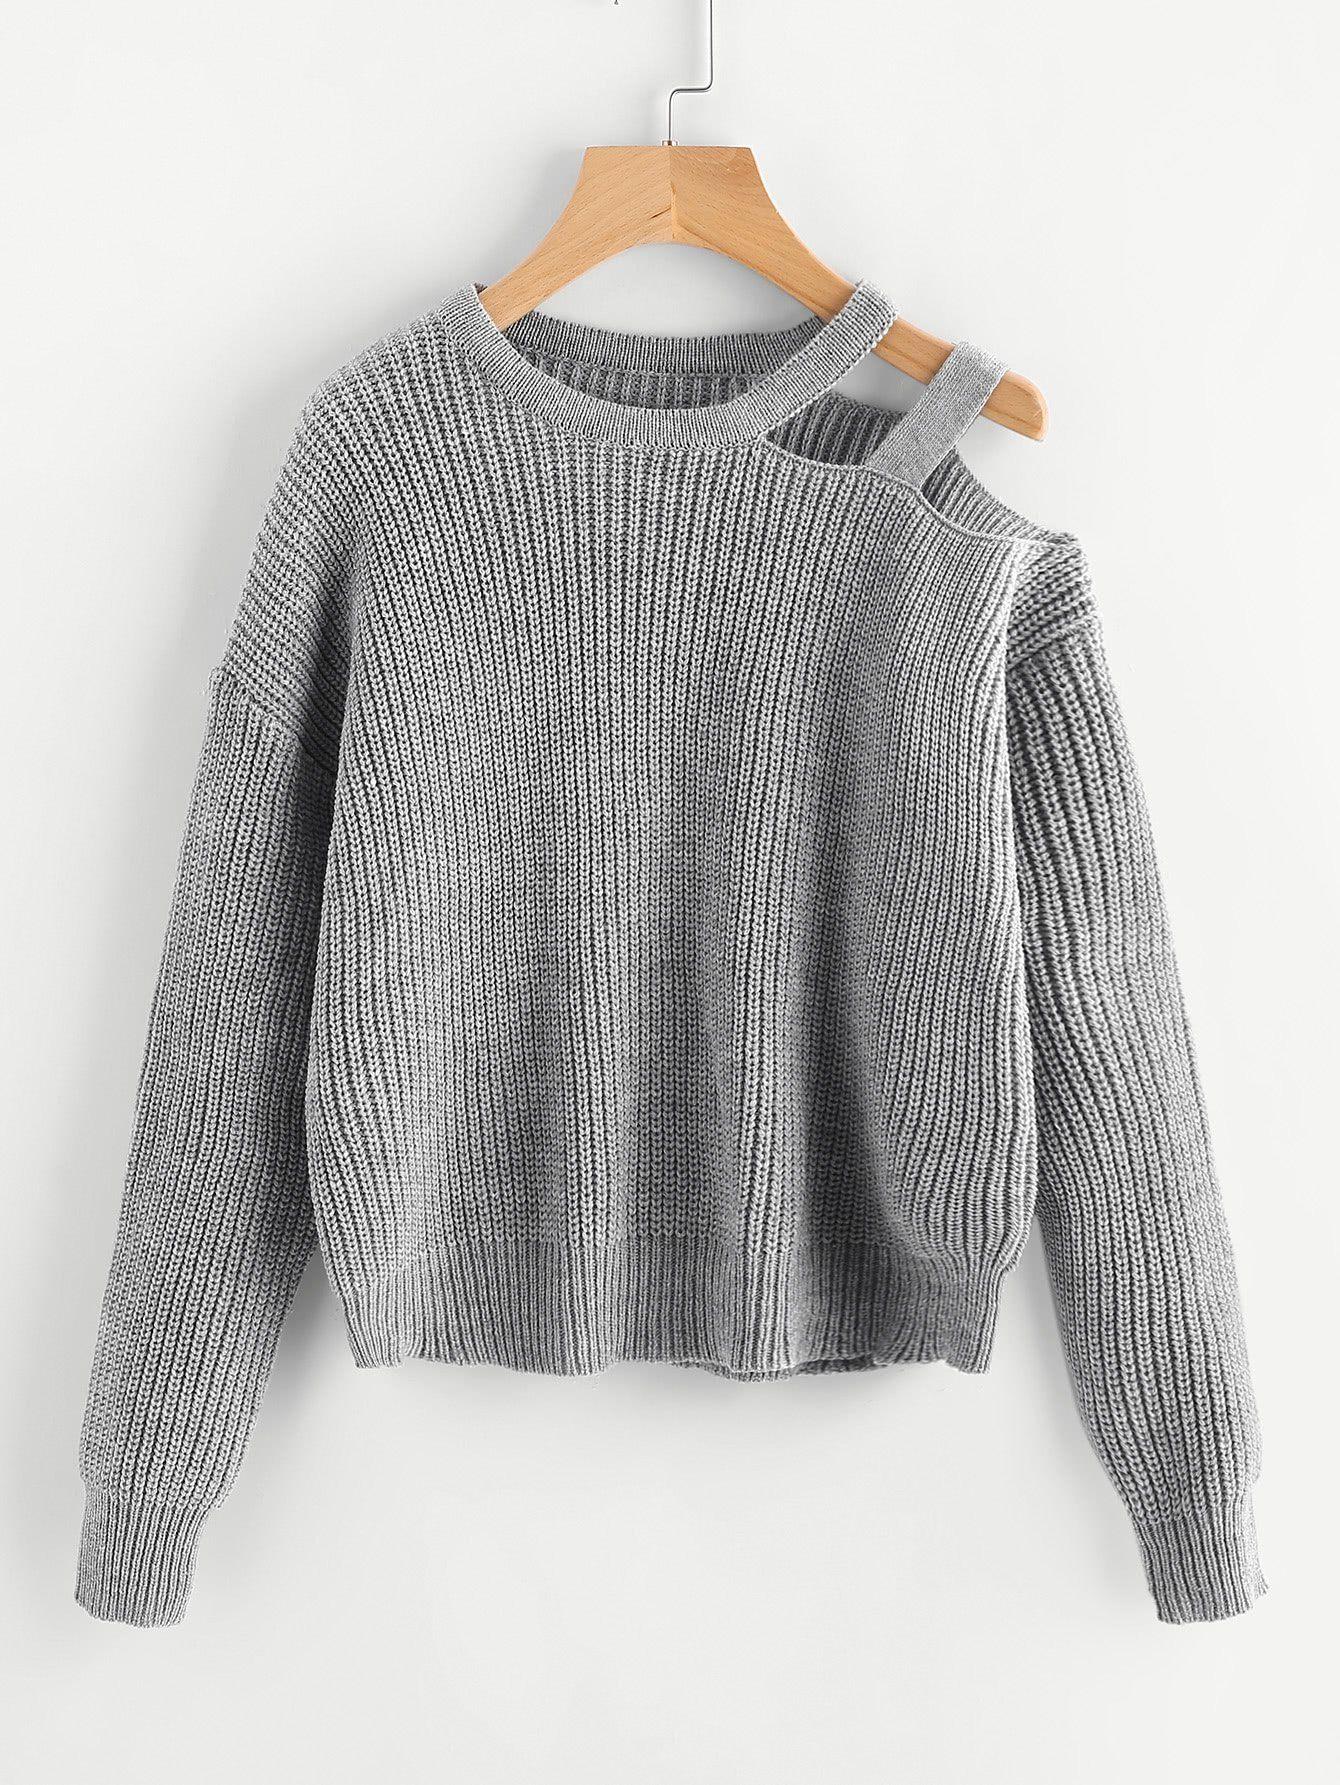 fe81c5c5c6ea Material  100% Acrylic Color  Grey Pattern Type  Plain Neckline  Round Neck  Style  Casual